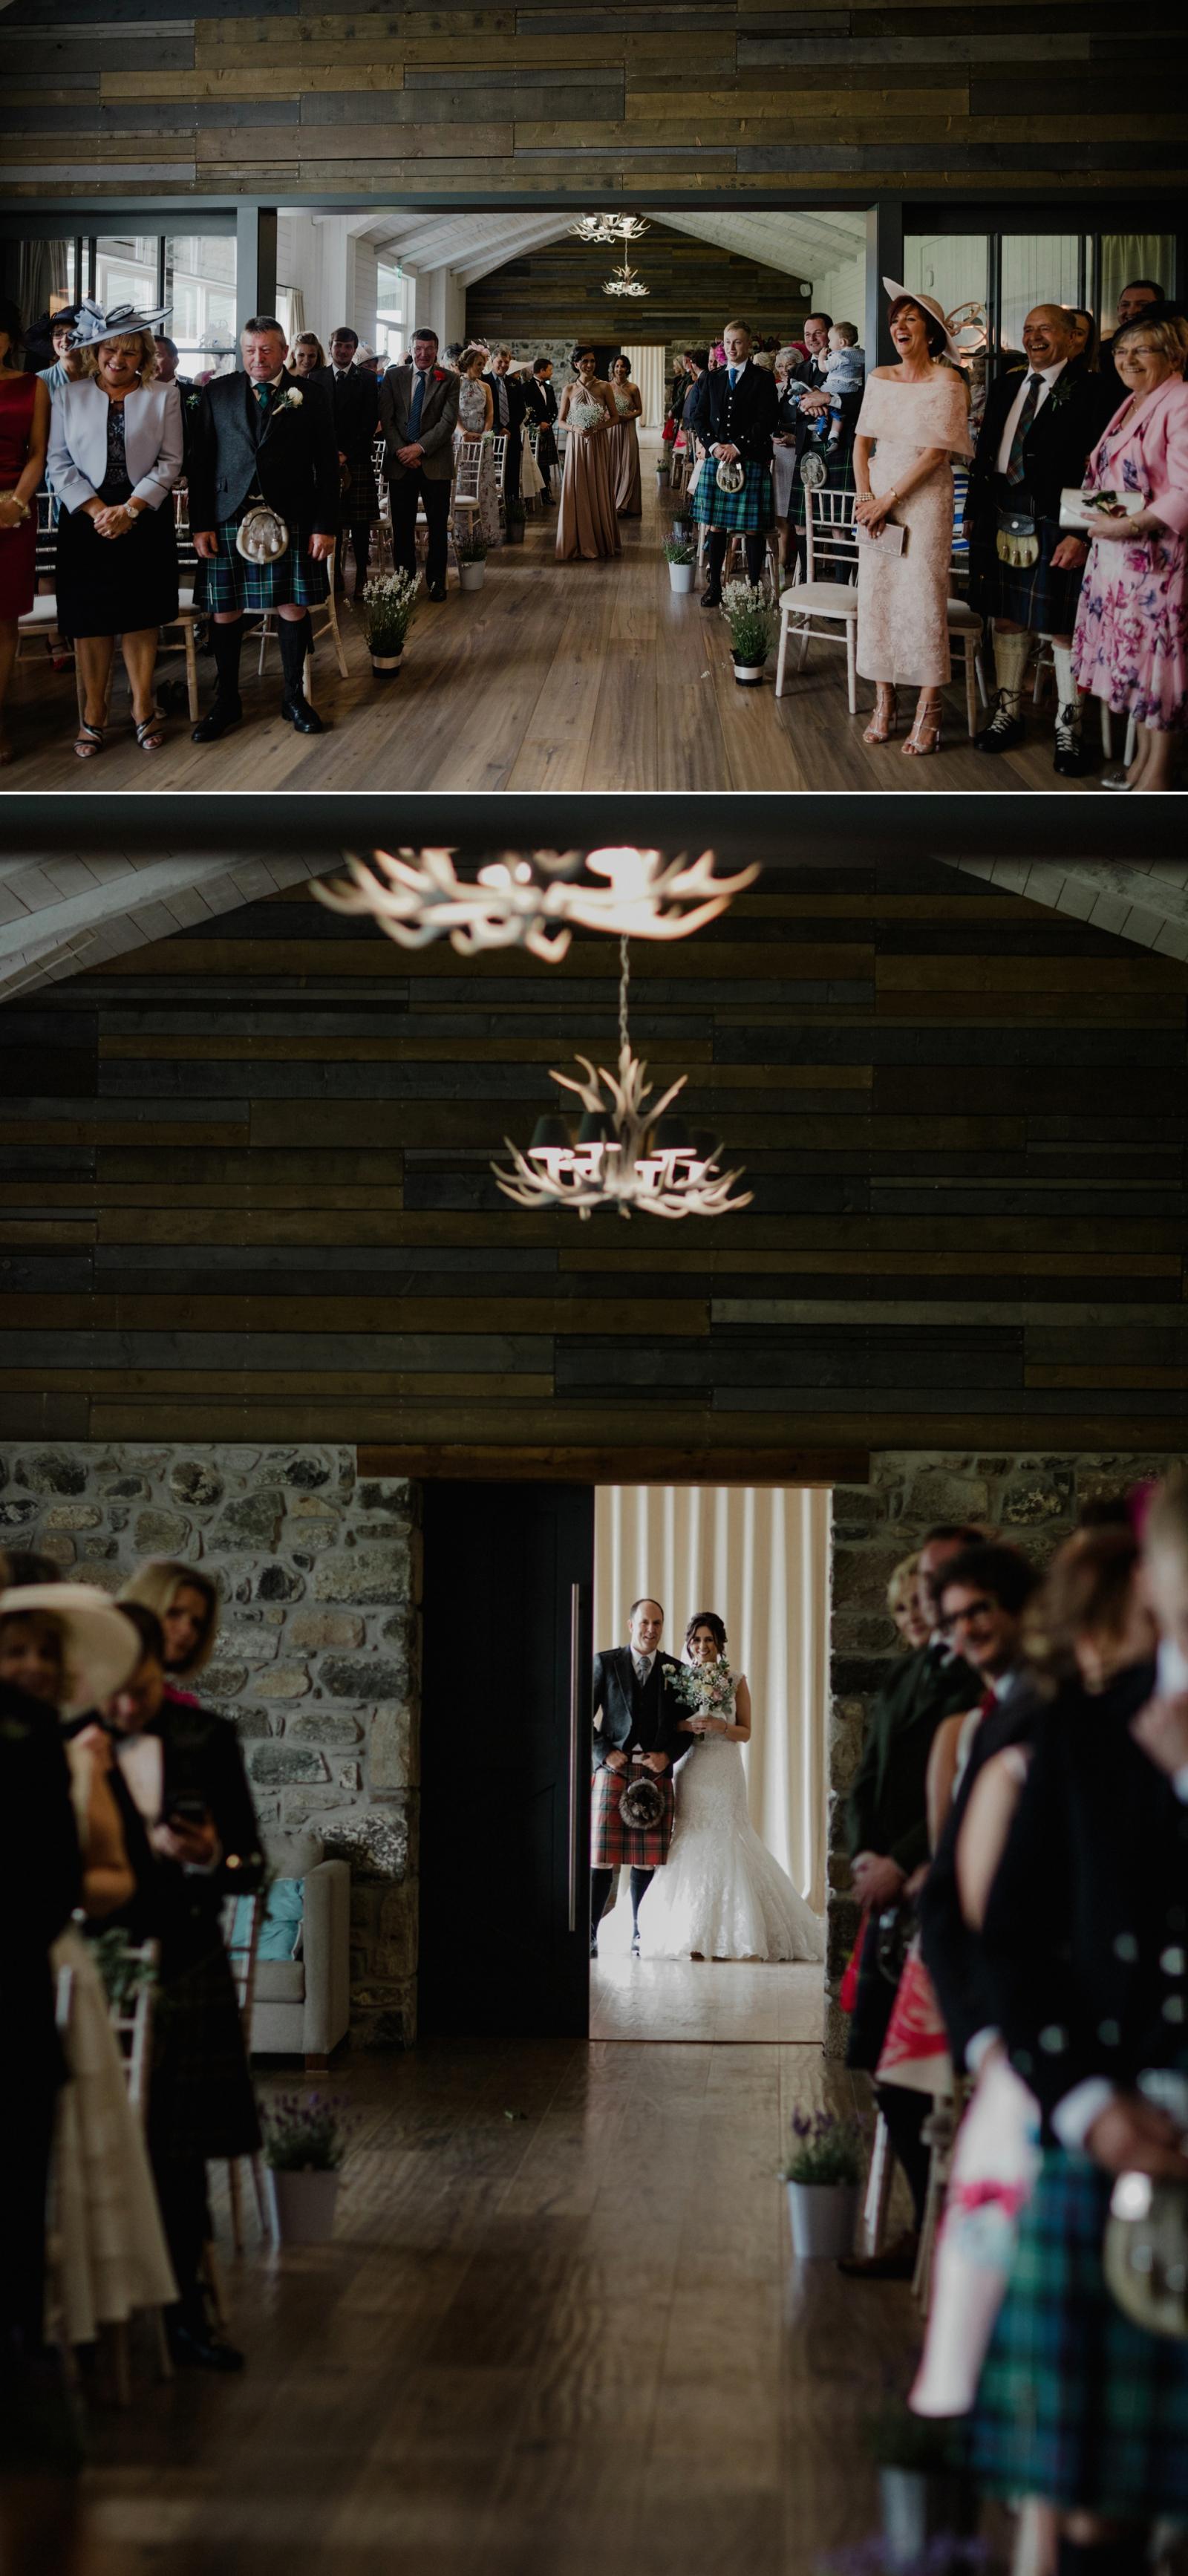 ELLIE_GARY_BARRA_CASTLE_WEDDING_ZOE_ALEXANDRA_PHOTOGRAPHY-0163.jpg